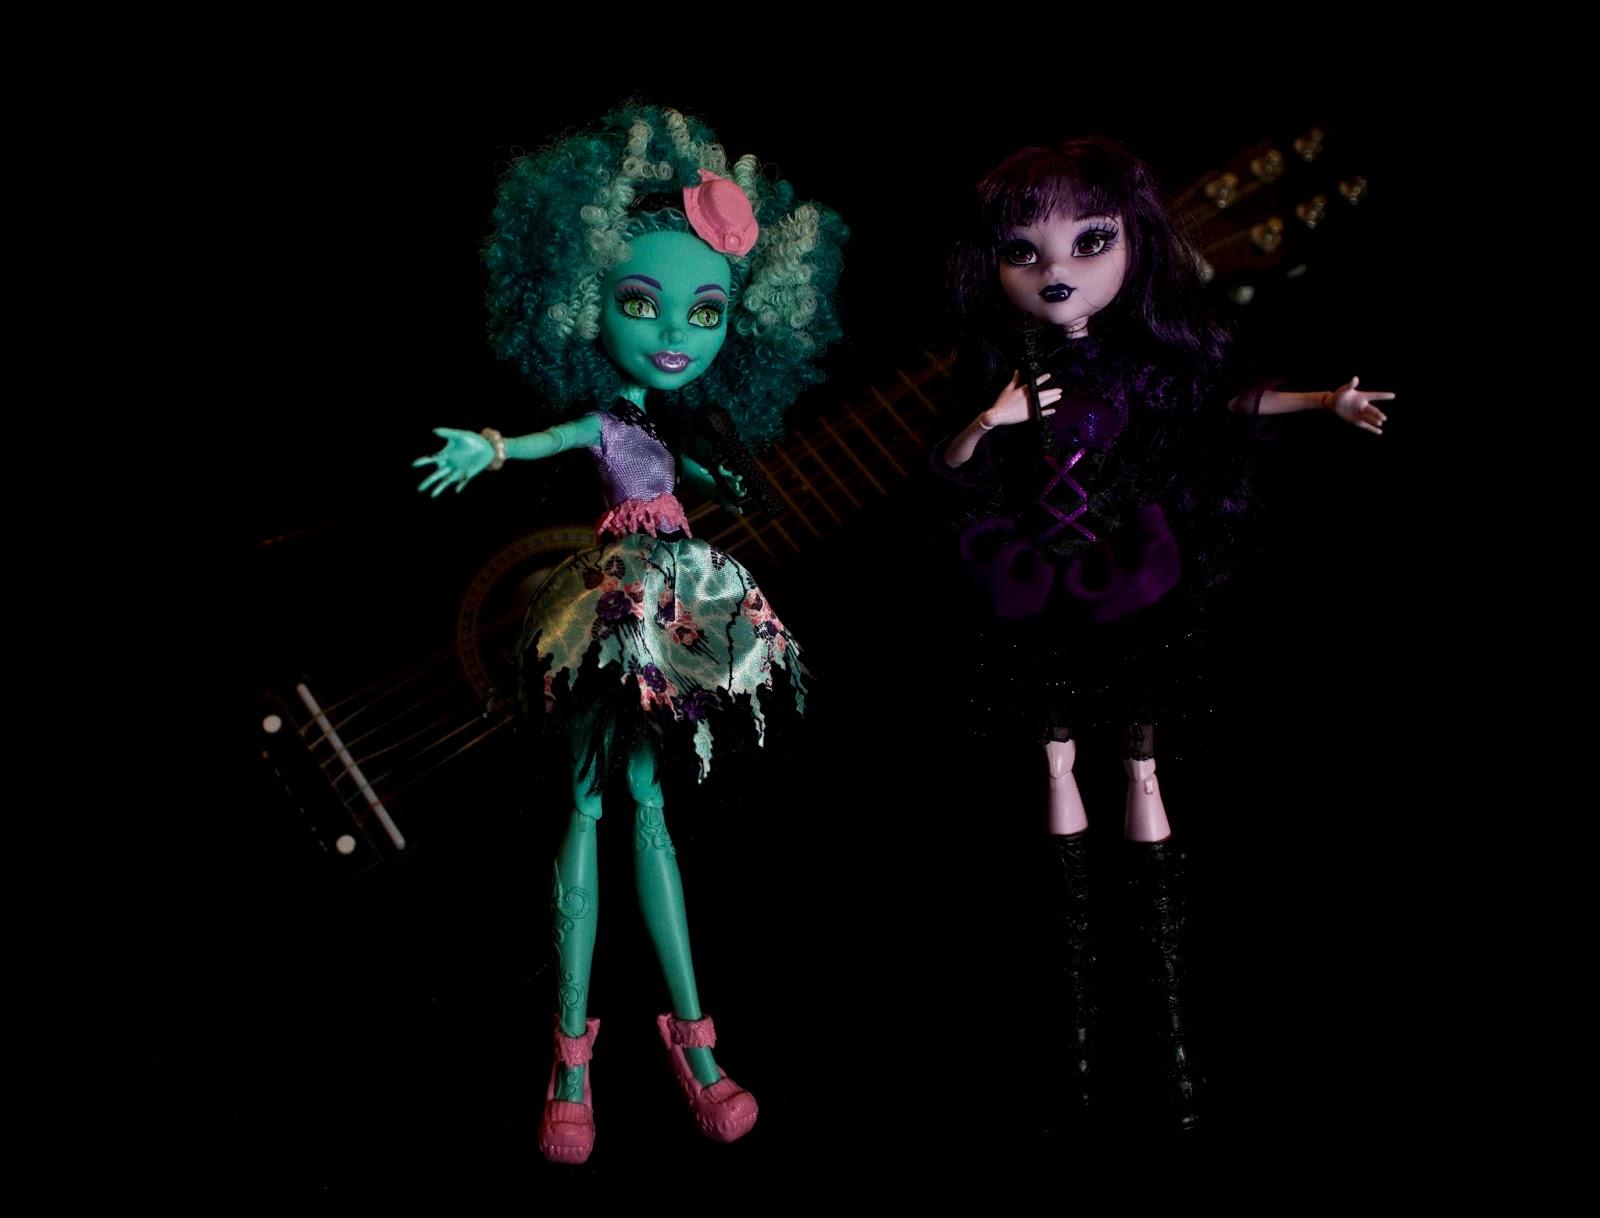 dolls in musical death concert